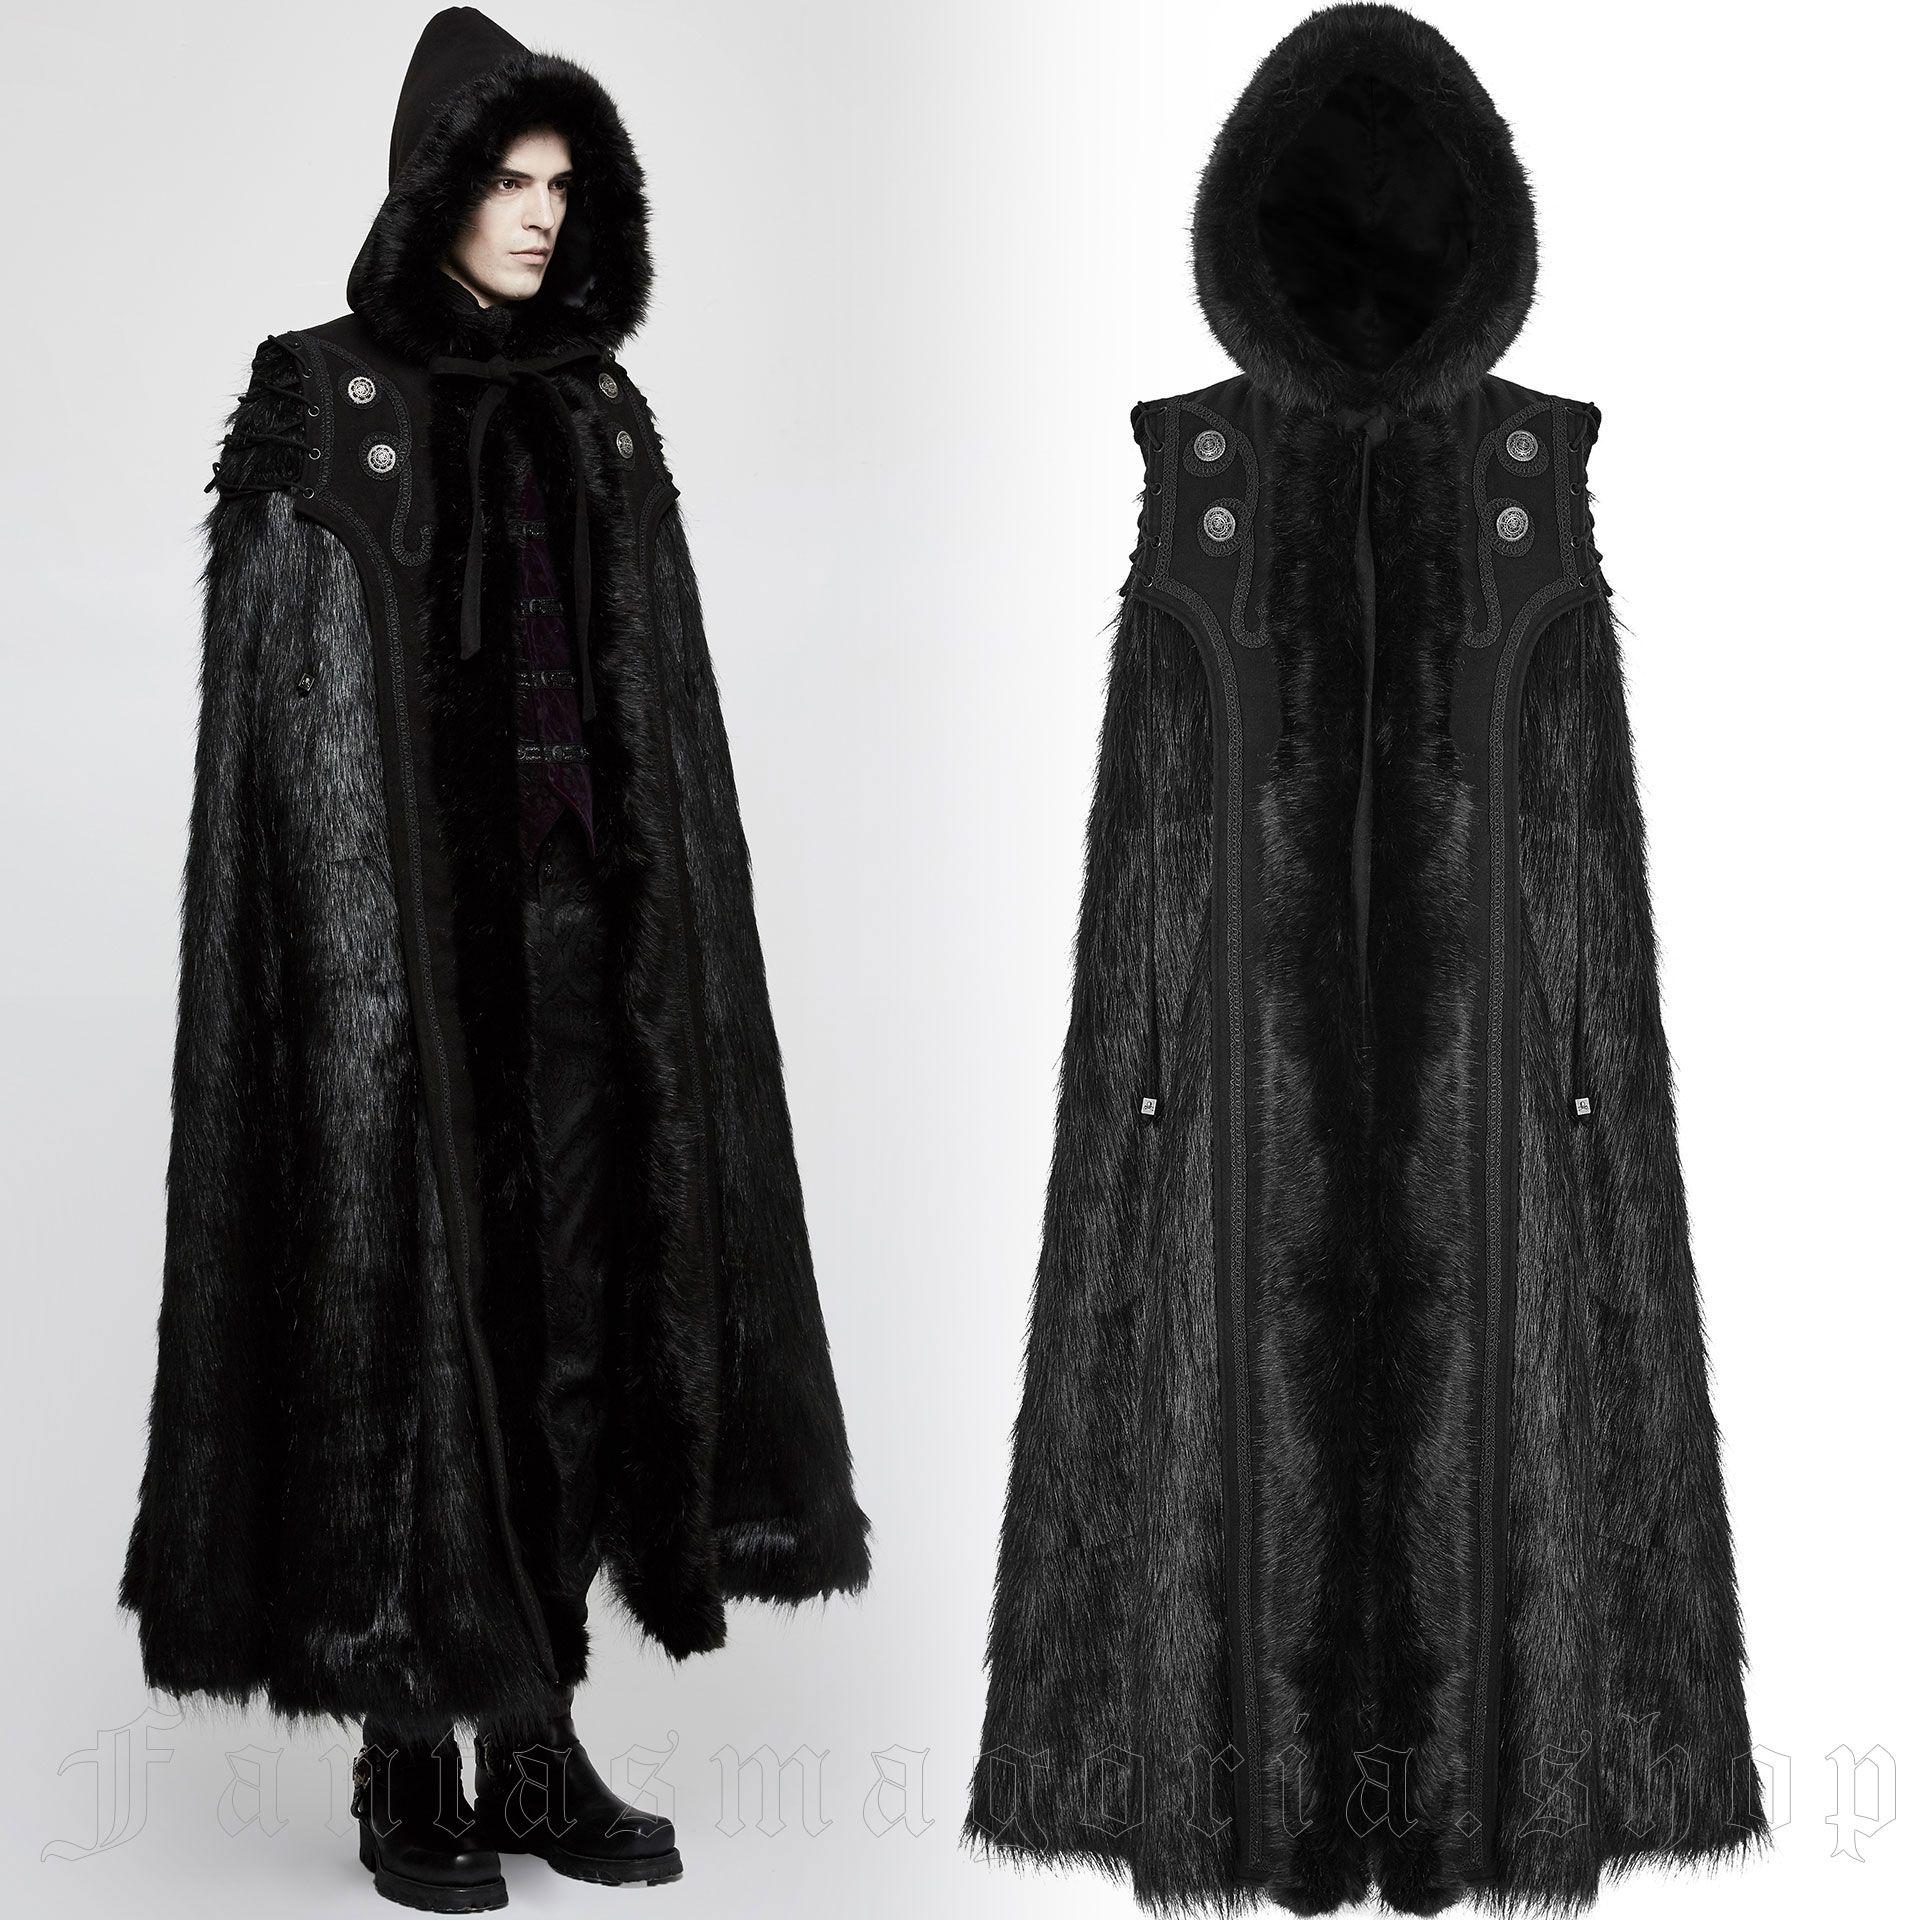 men's Fenrir Wolf Cloak by PUNK RAVE brand, code: Y-803